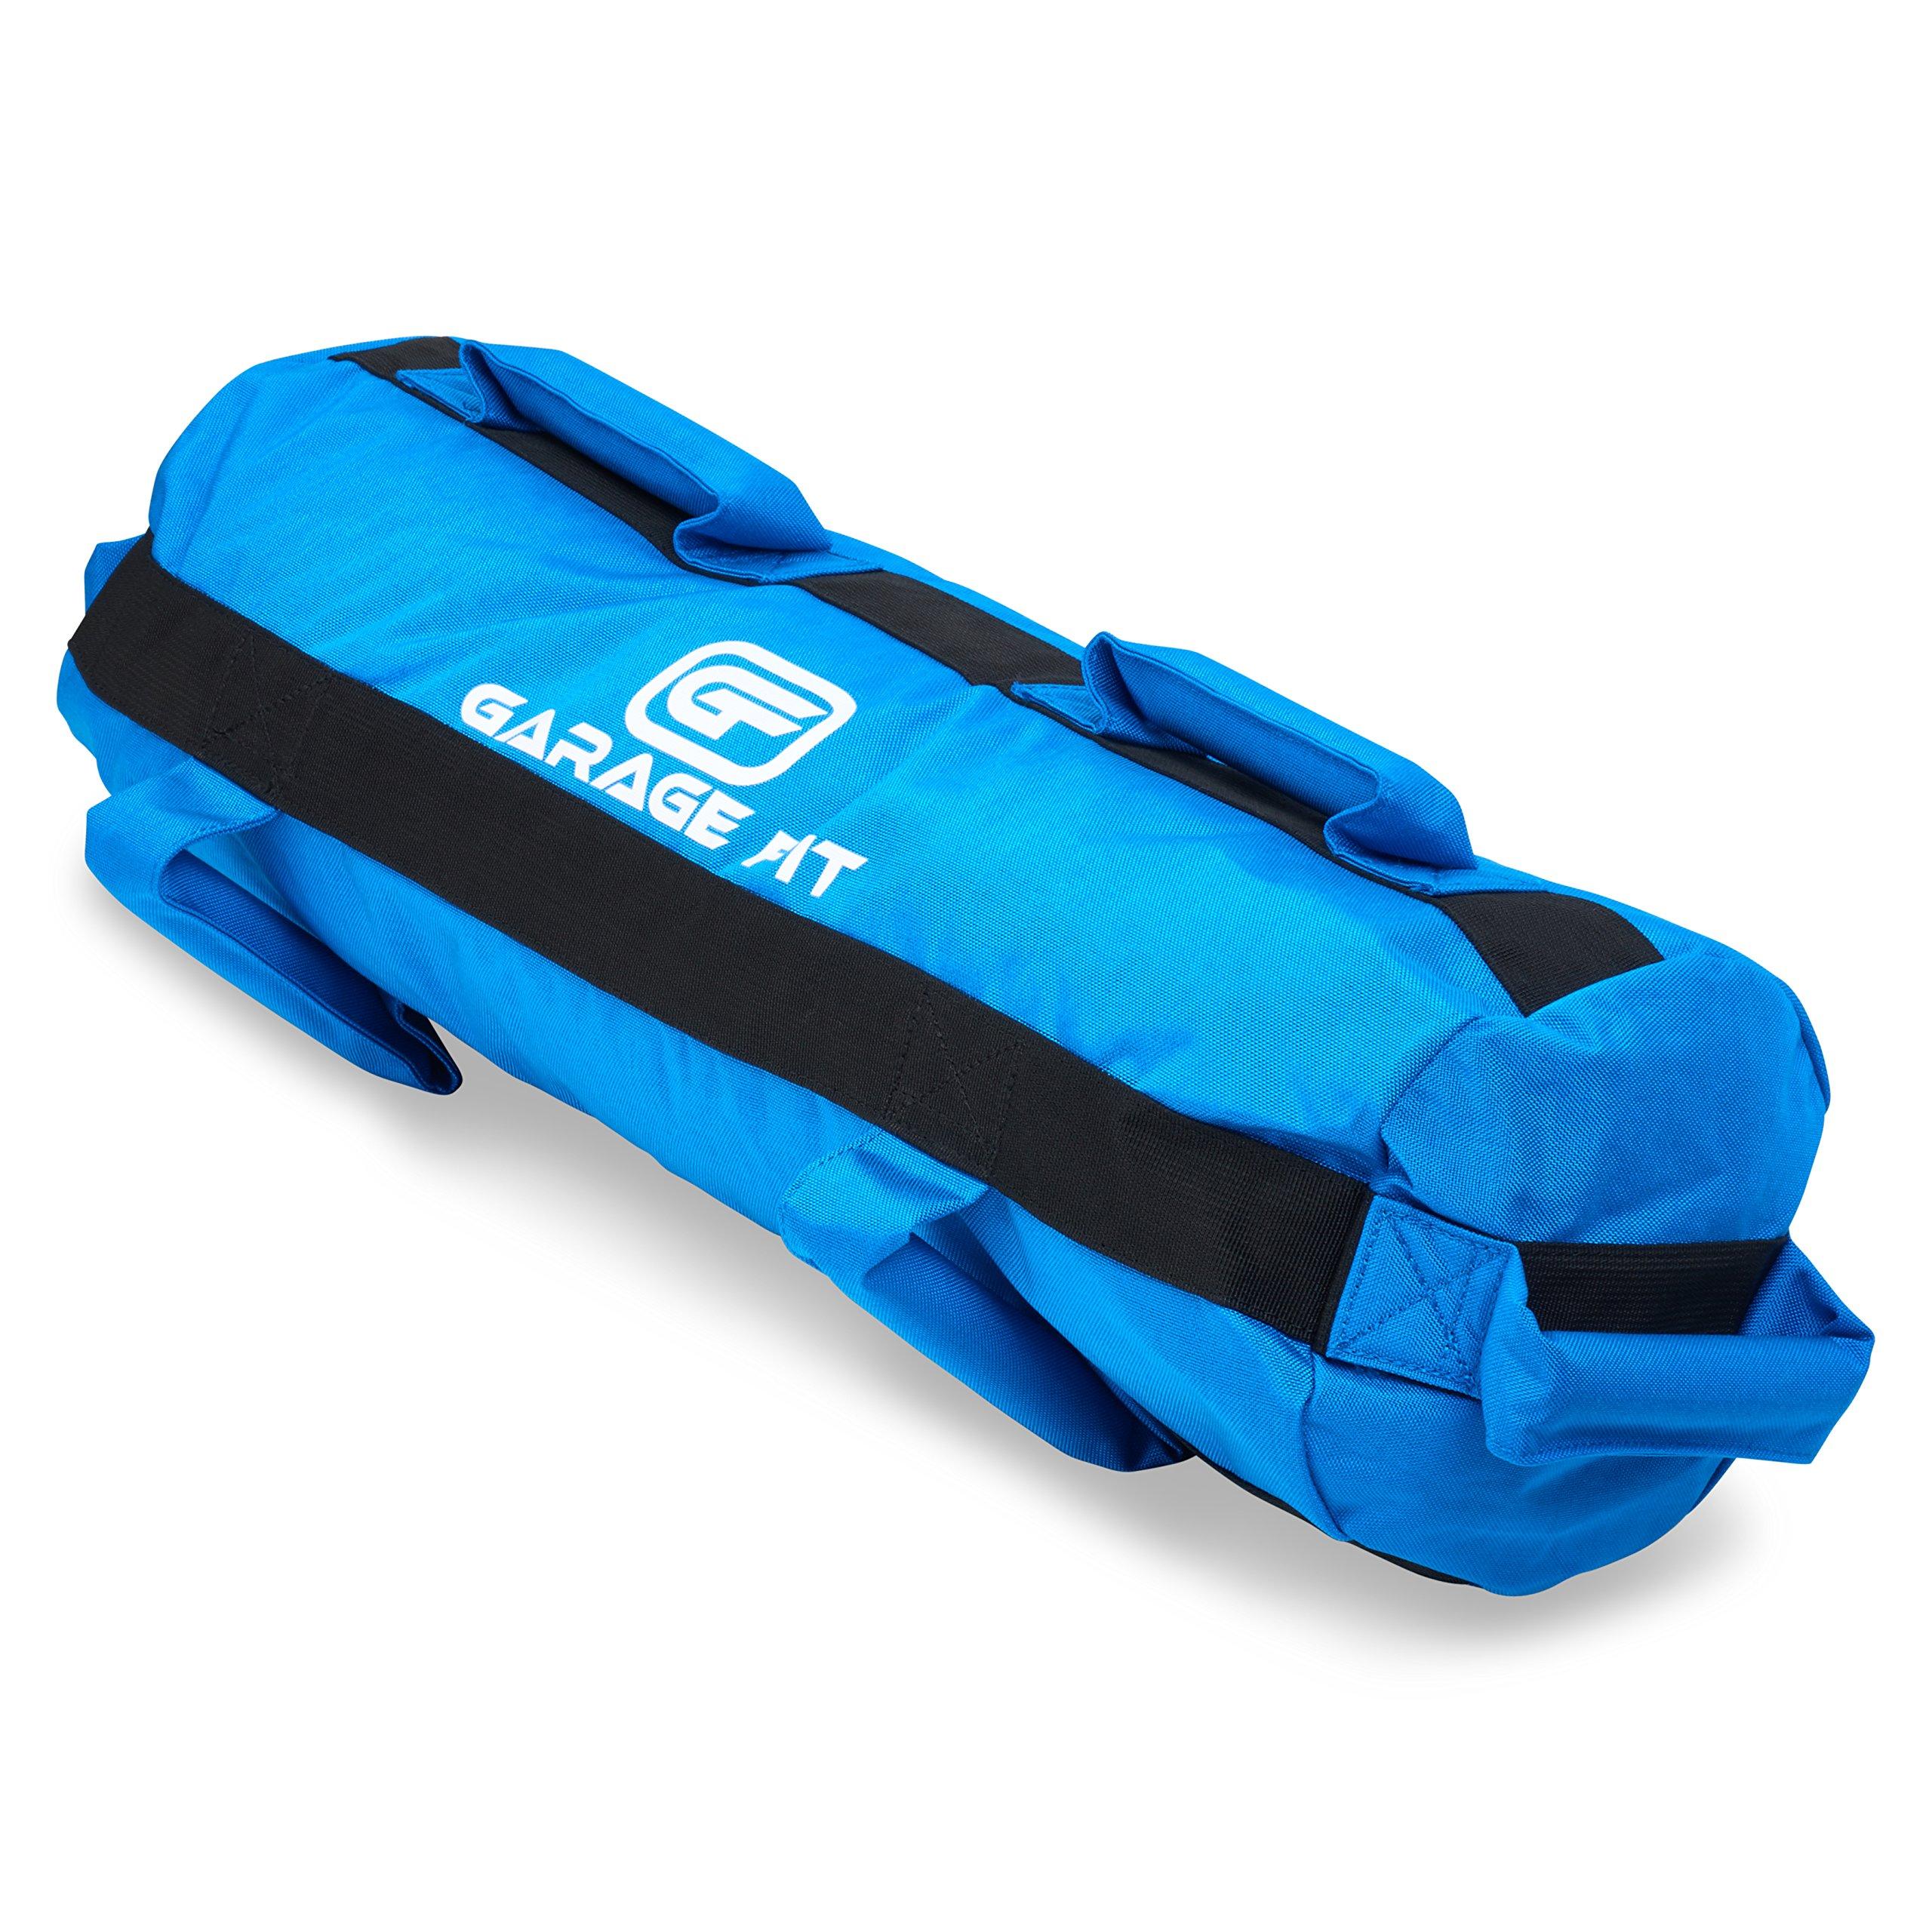 Garage Fit Heavy Duty Workout Sandbags for Fitness, Exercise Sandbags, Military Sandbags, Weighted Bags, Weighted Sandbag, Fitness Sandbags, Training Sandbags (Blue Rubber Core Handle, 80-120 lbs)